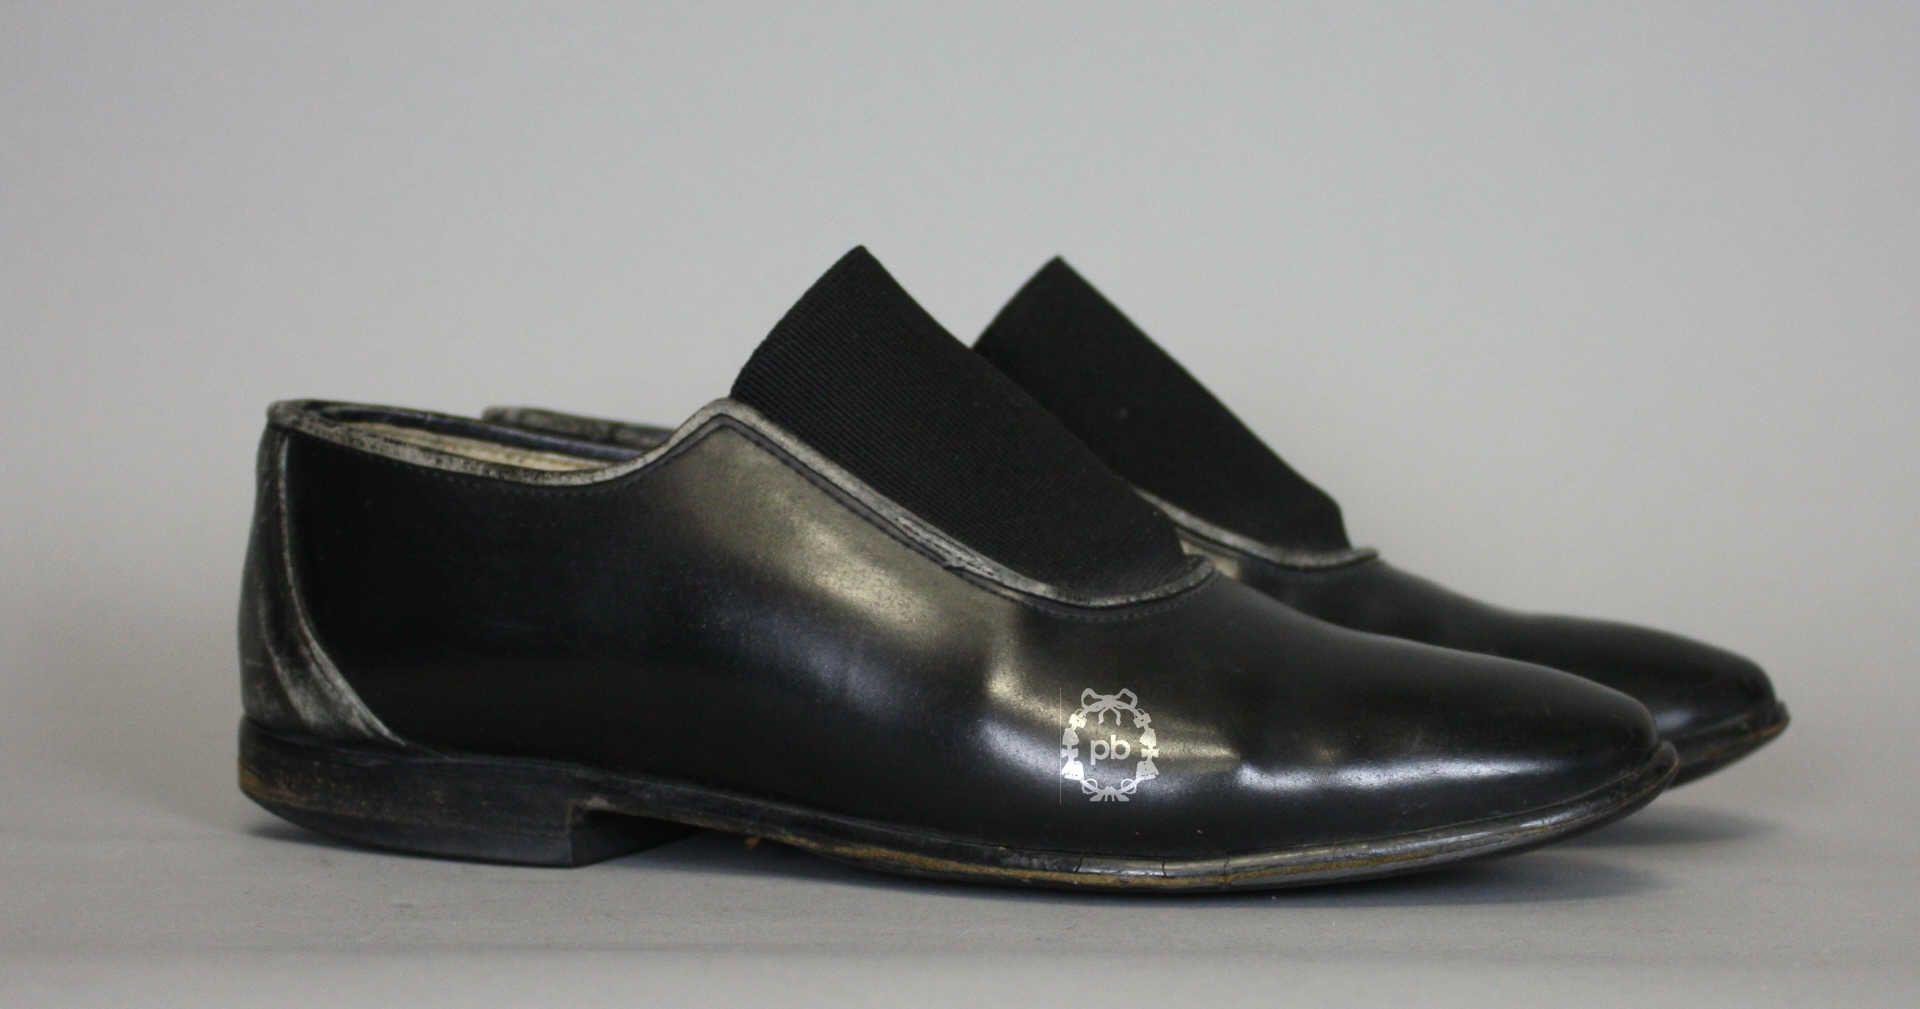 576bc6a02e34d Tokio Kumagai | F16 Shoes | Shoes, Boots, Fashion